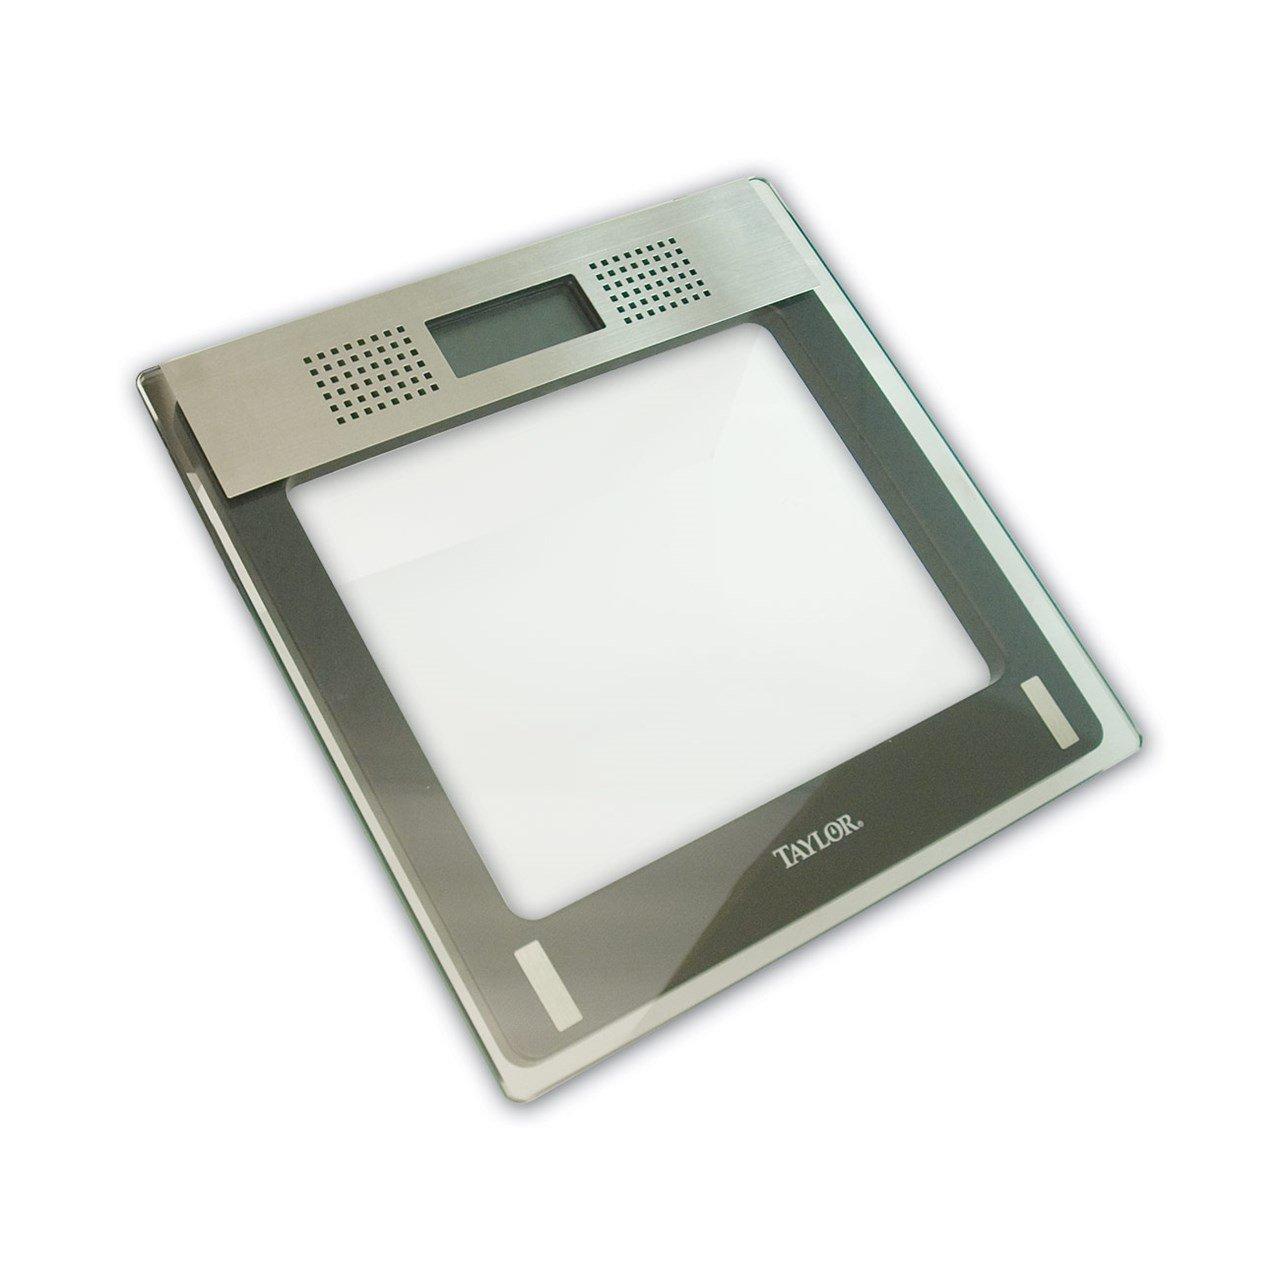 Talking Digital Bathroom Scale - 440-lb Capacity by MaxiAids